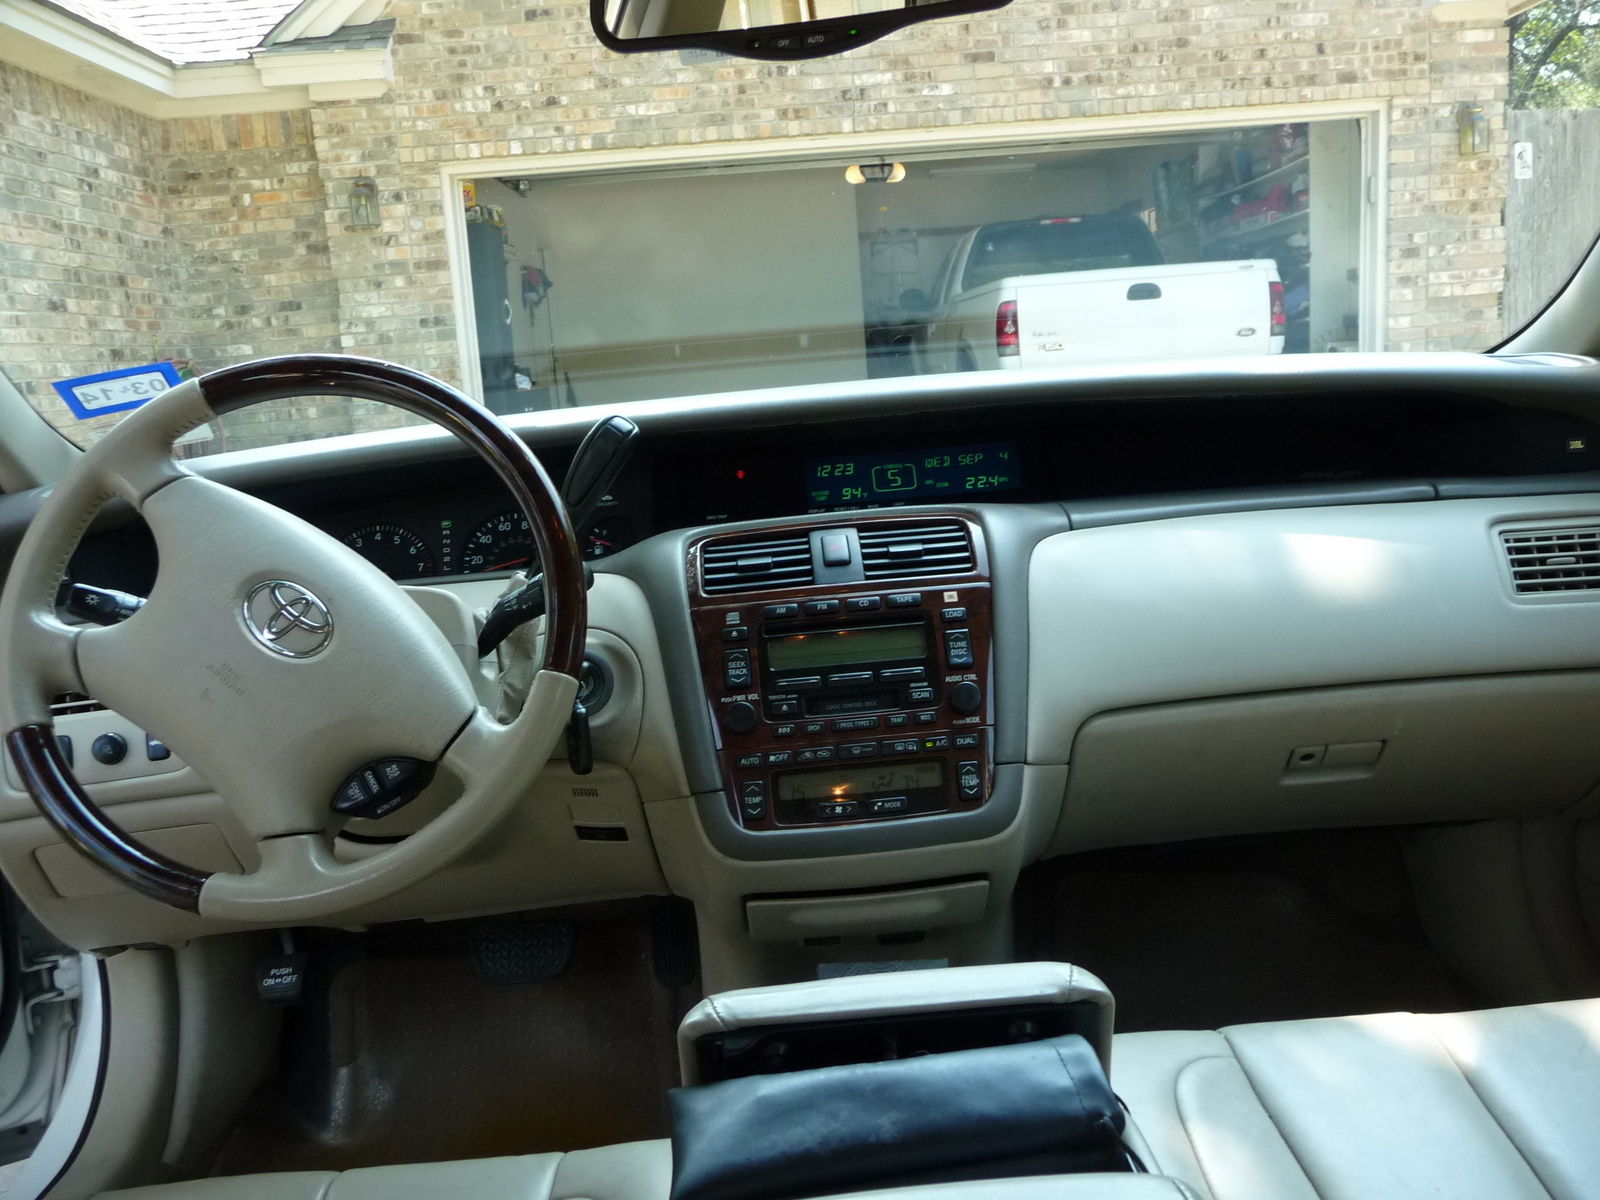 Toyota Avalon Xls Pic